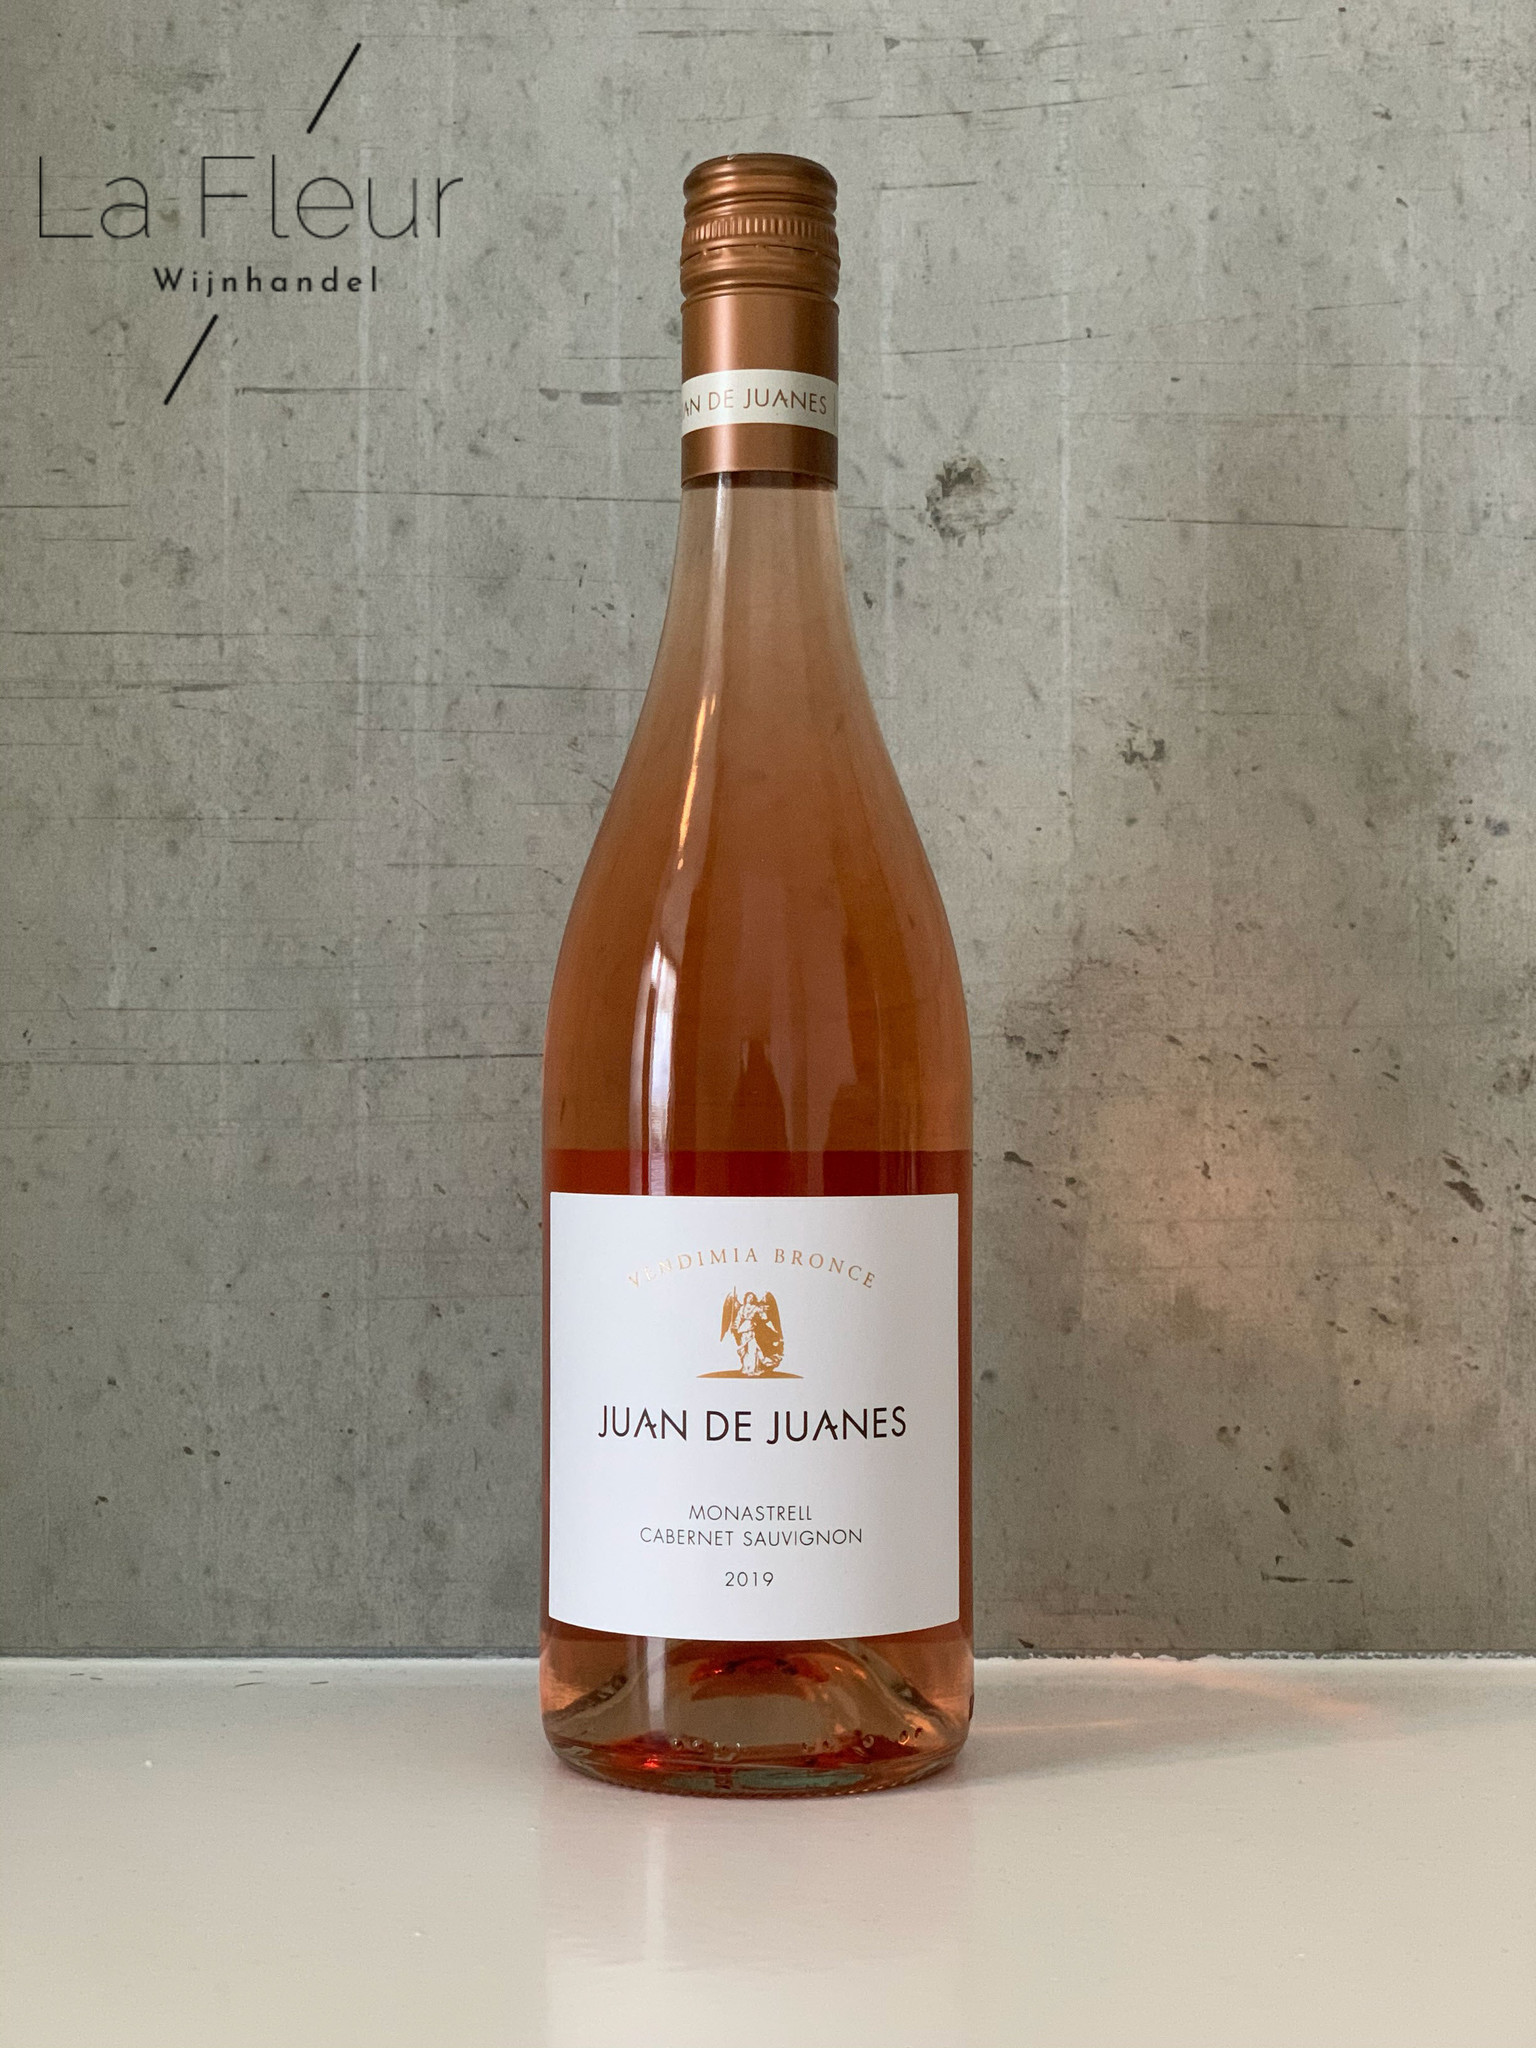 Viños Annecoop Juan De Juanes - Monastrell Cabernet Sauvignon Rosé